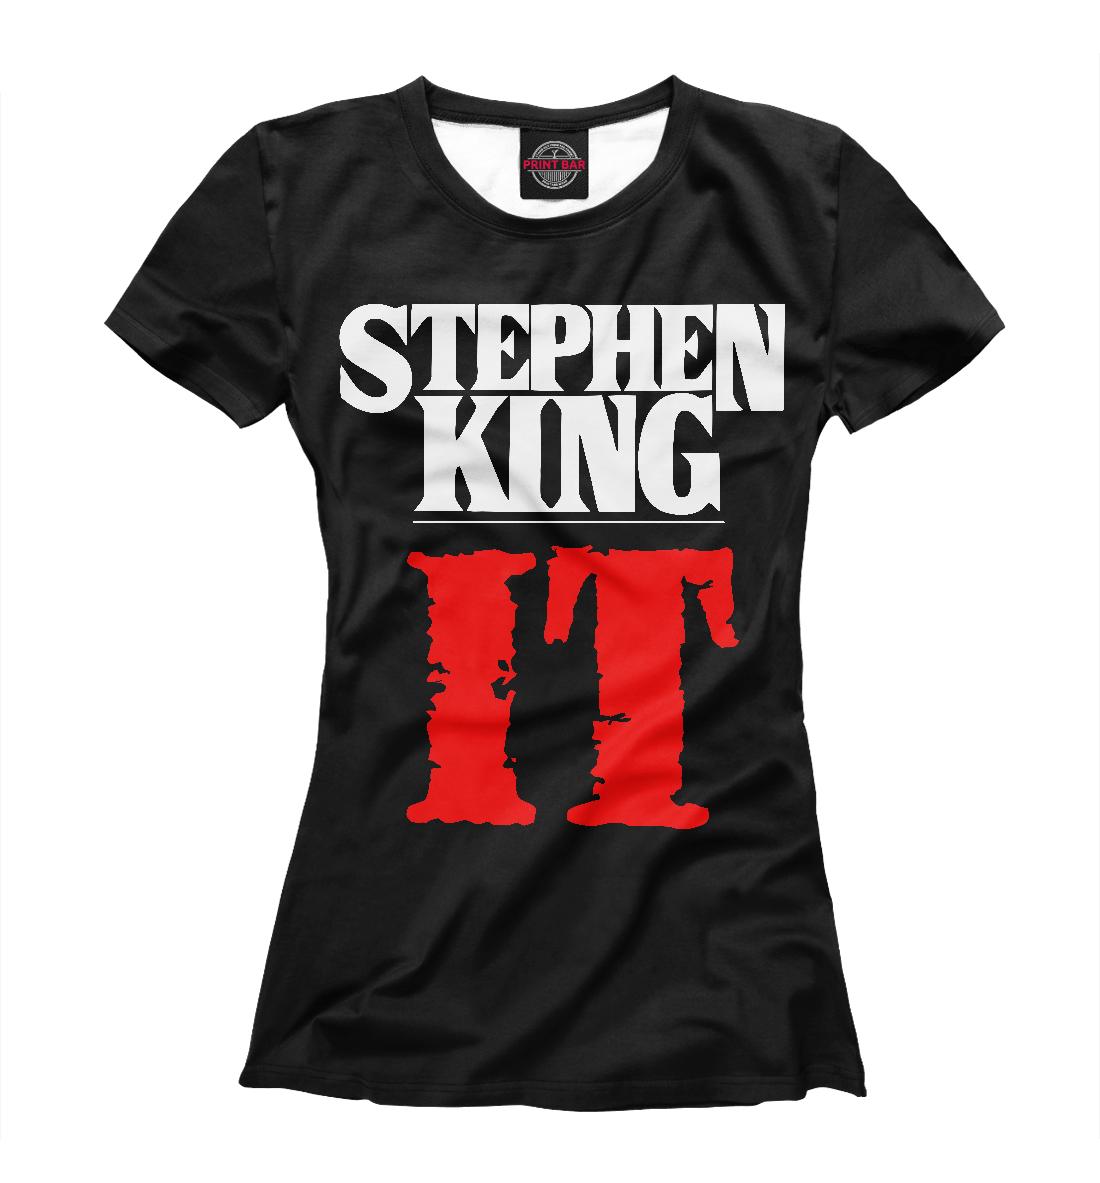 Купить Стивен Кинг - Оно, Printbar, Футболки, ONO-834218-fut-1